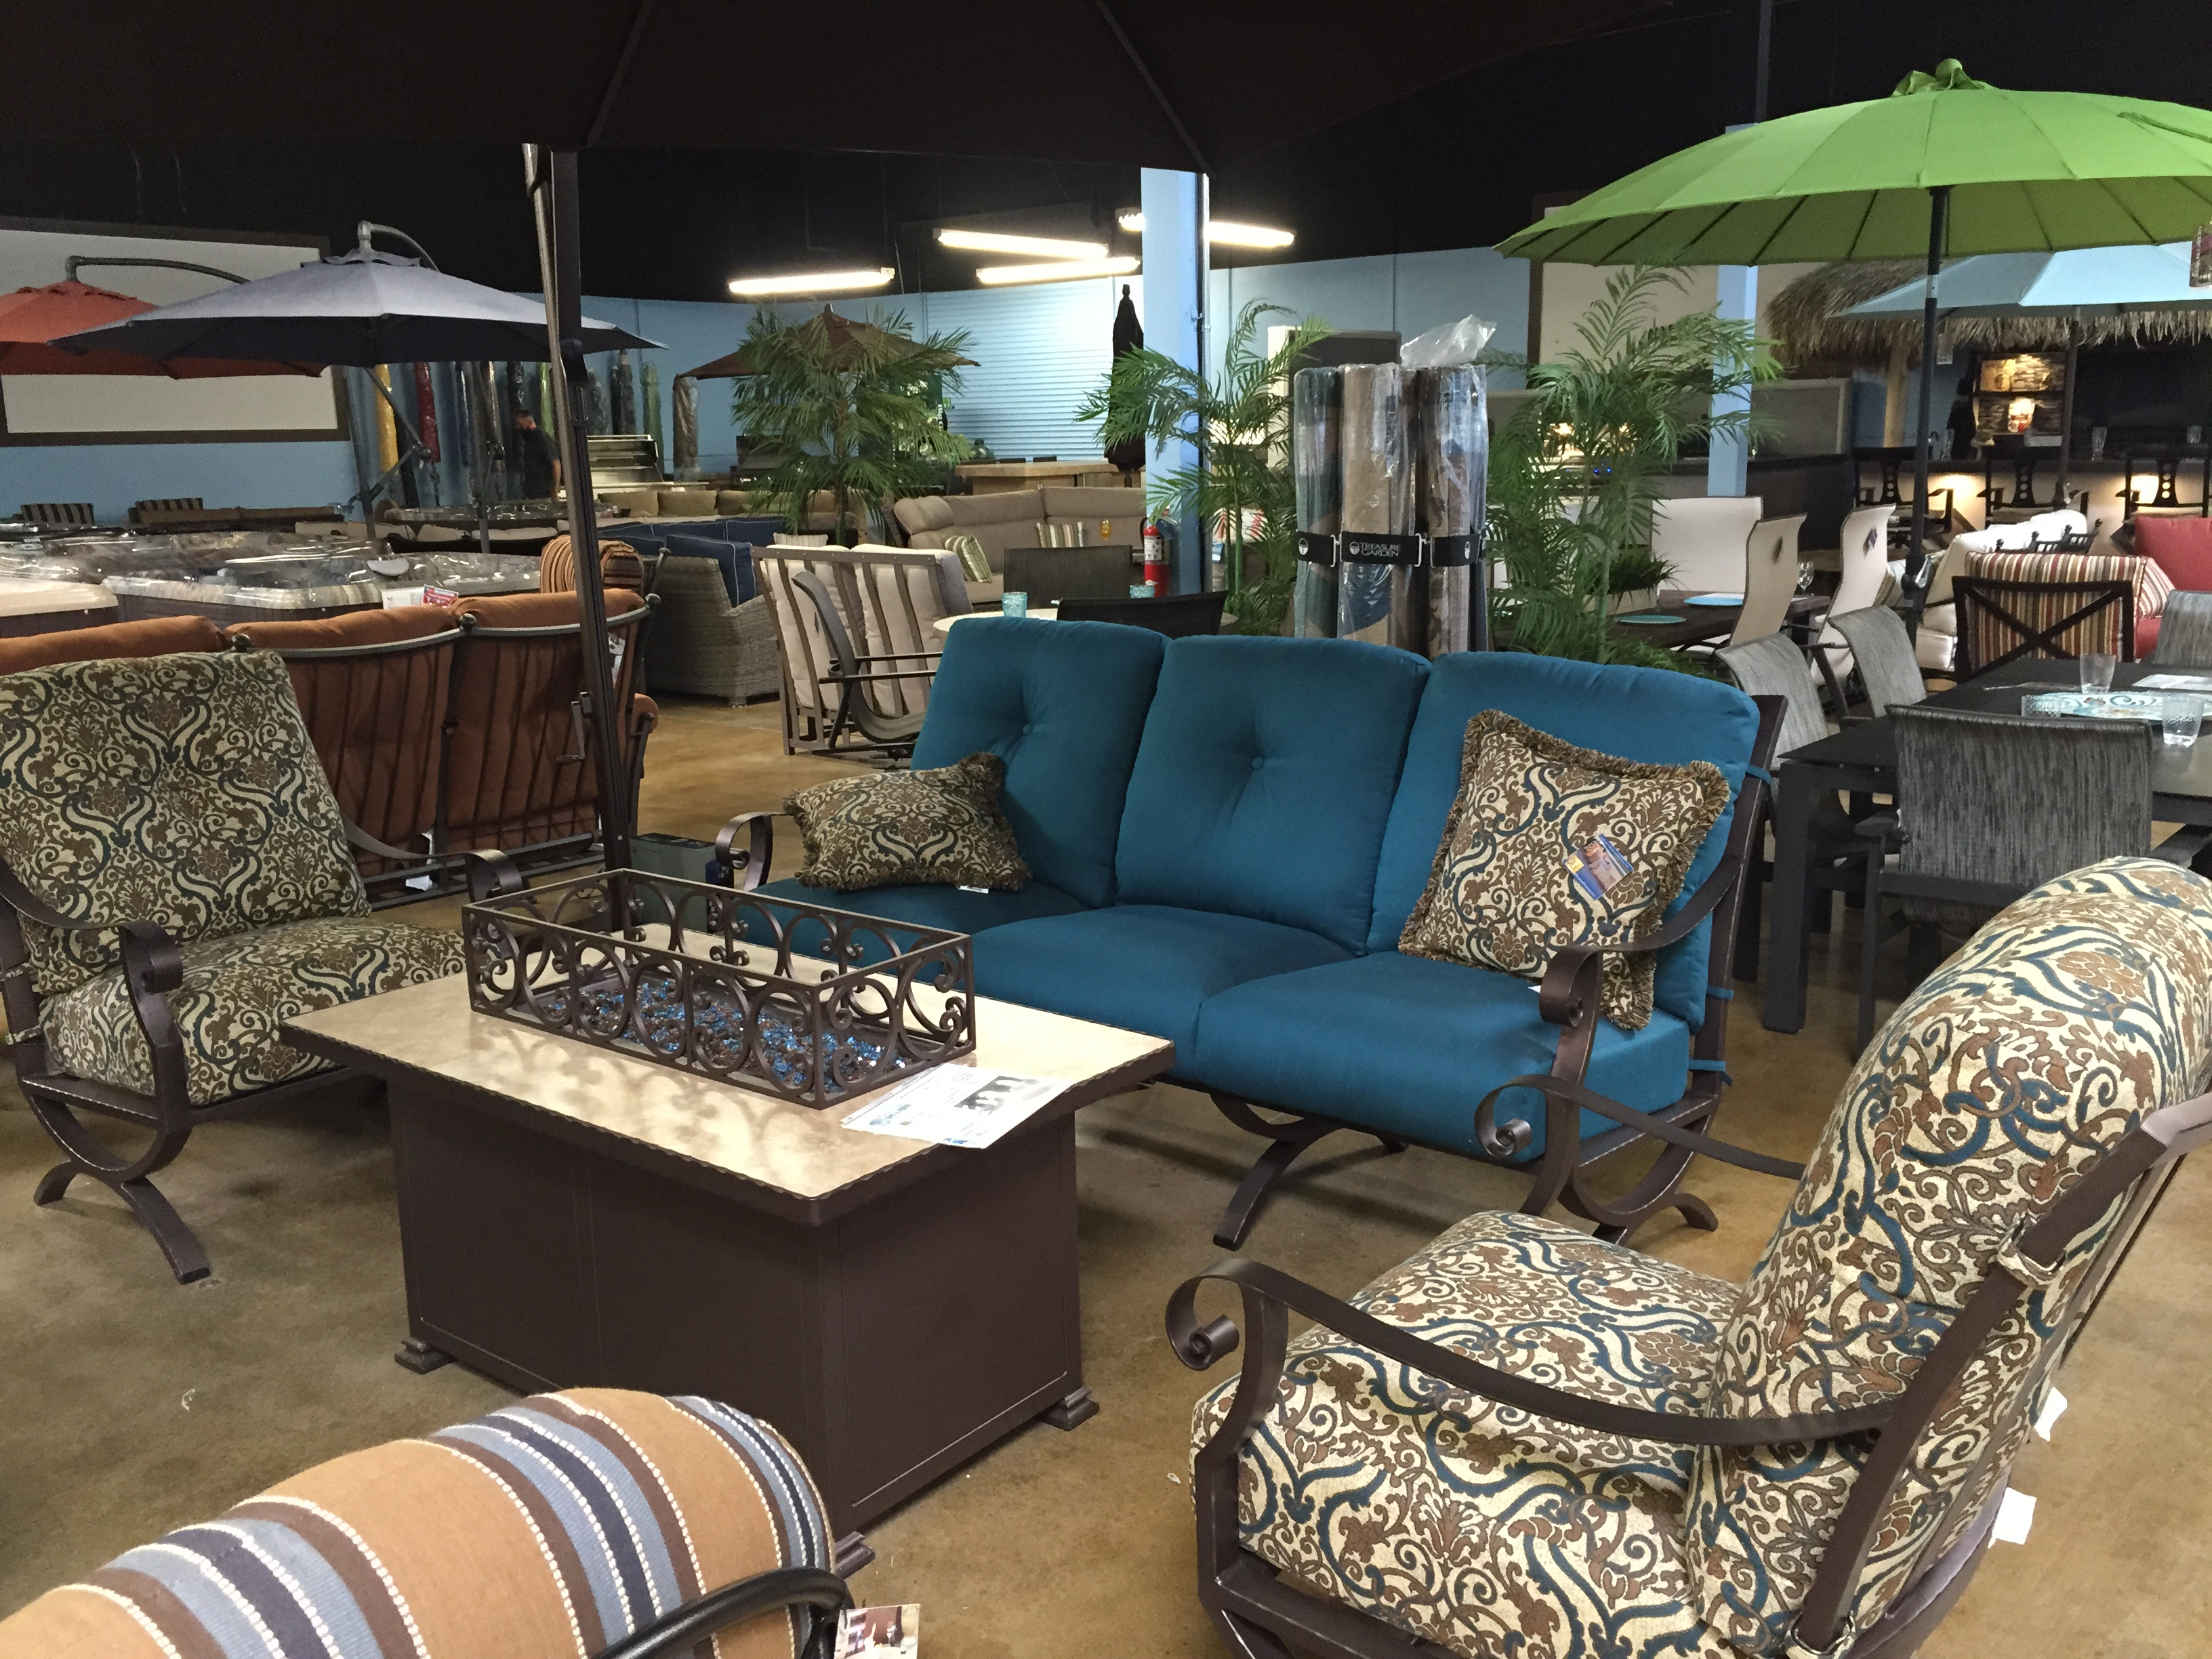 coastal spa and patio superstore 735 w orangethorpe ave placentia ca 92870